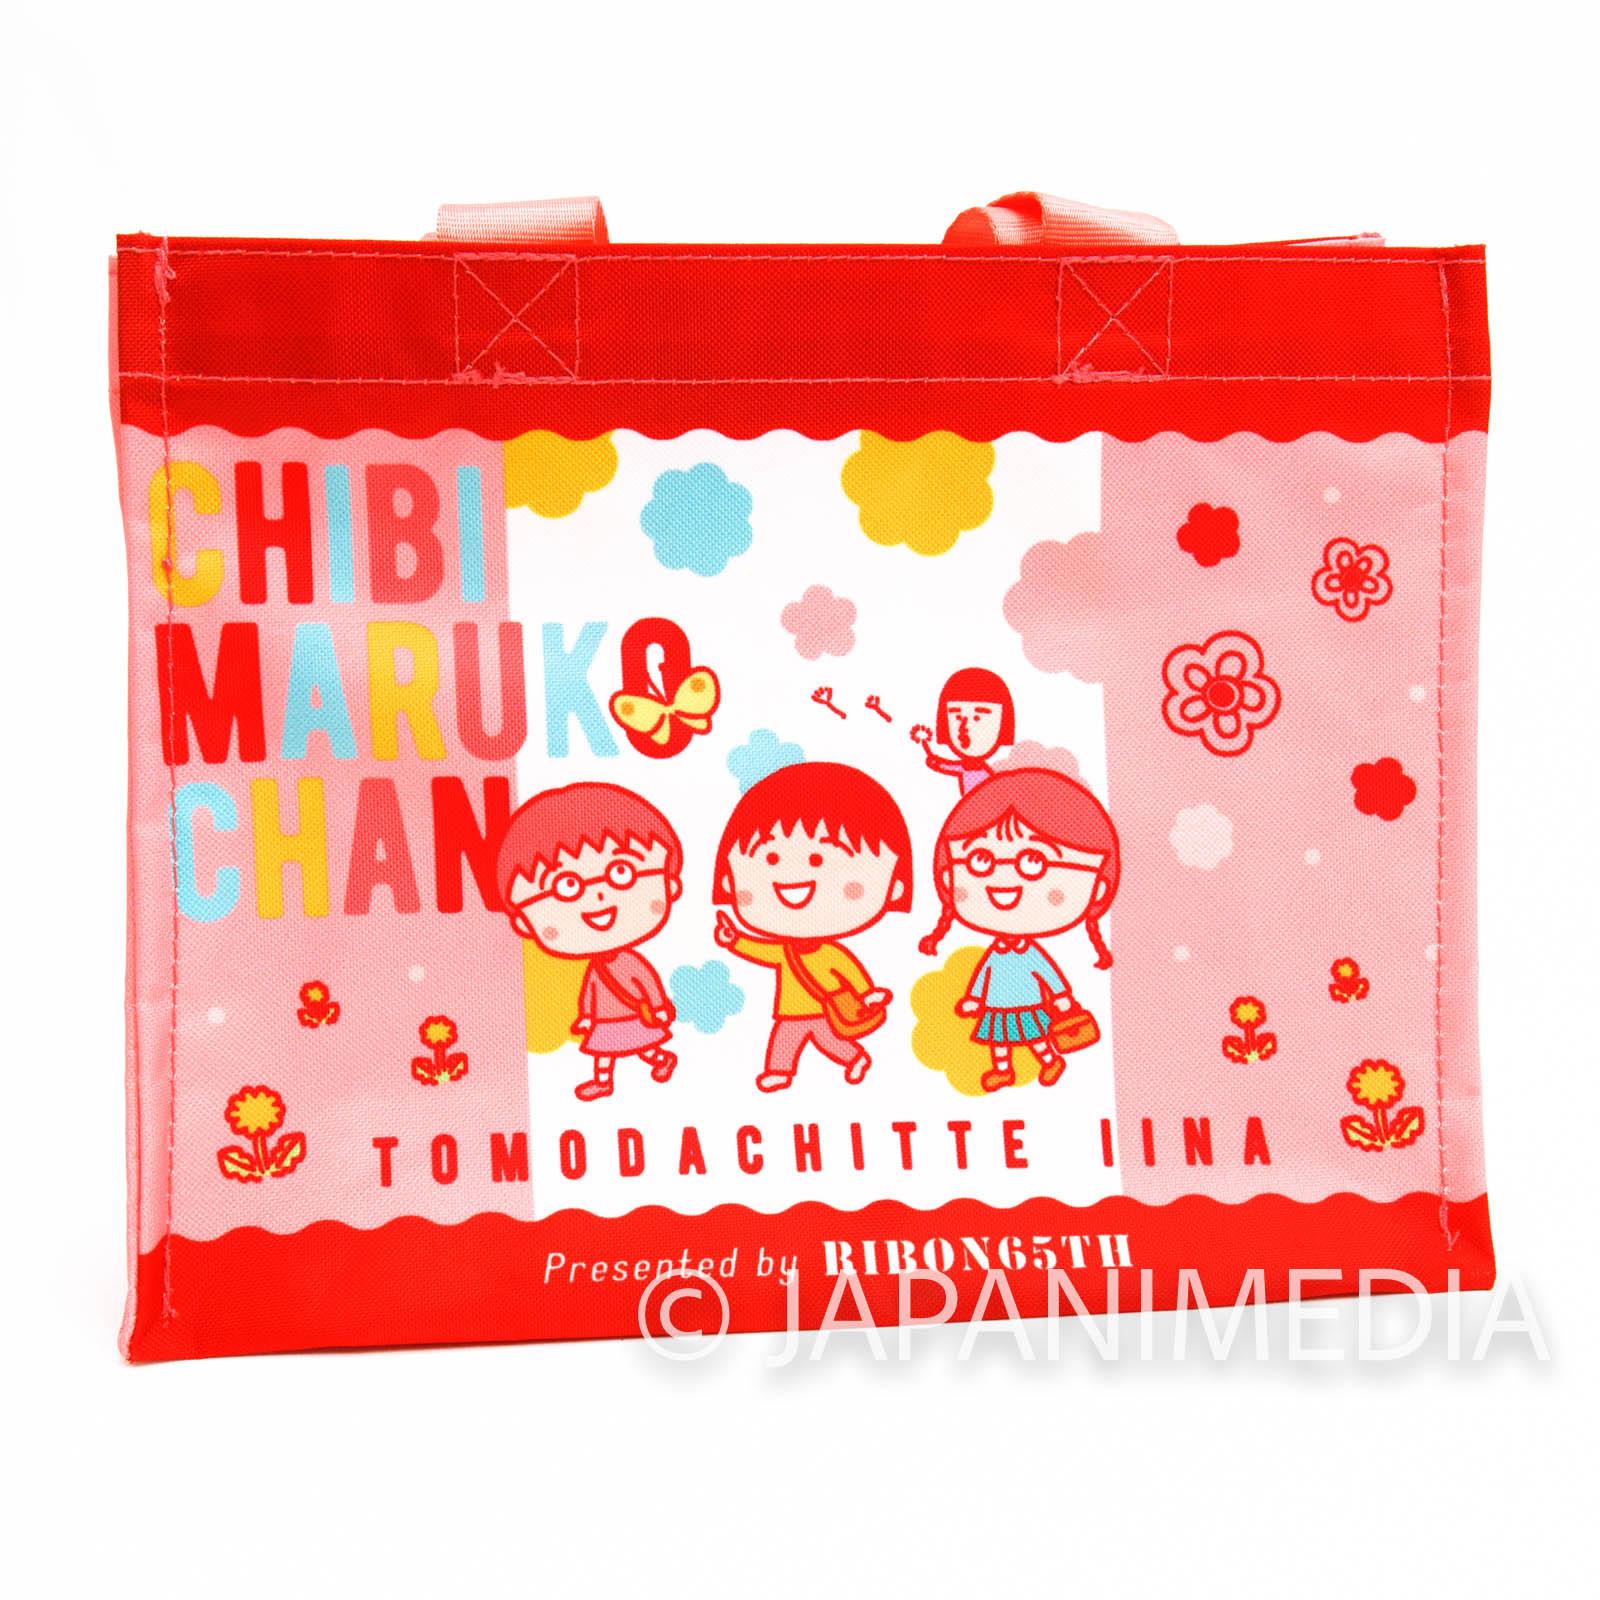 Chibi Maruko Chan Ribon 65th Anniversary Bag JAPAN MANGA